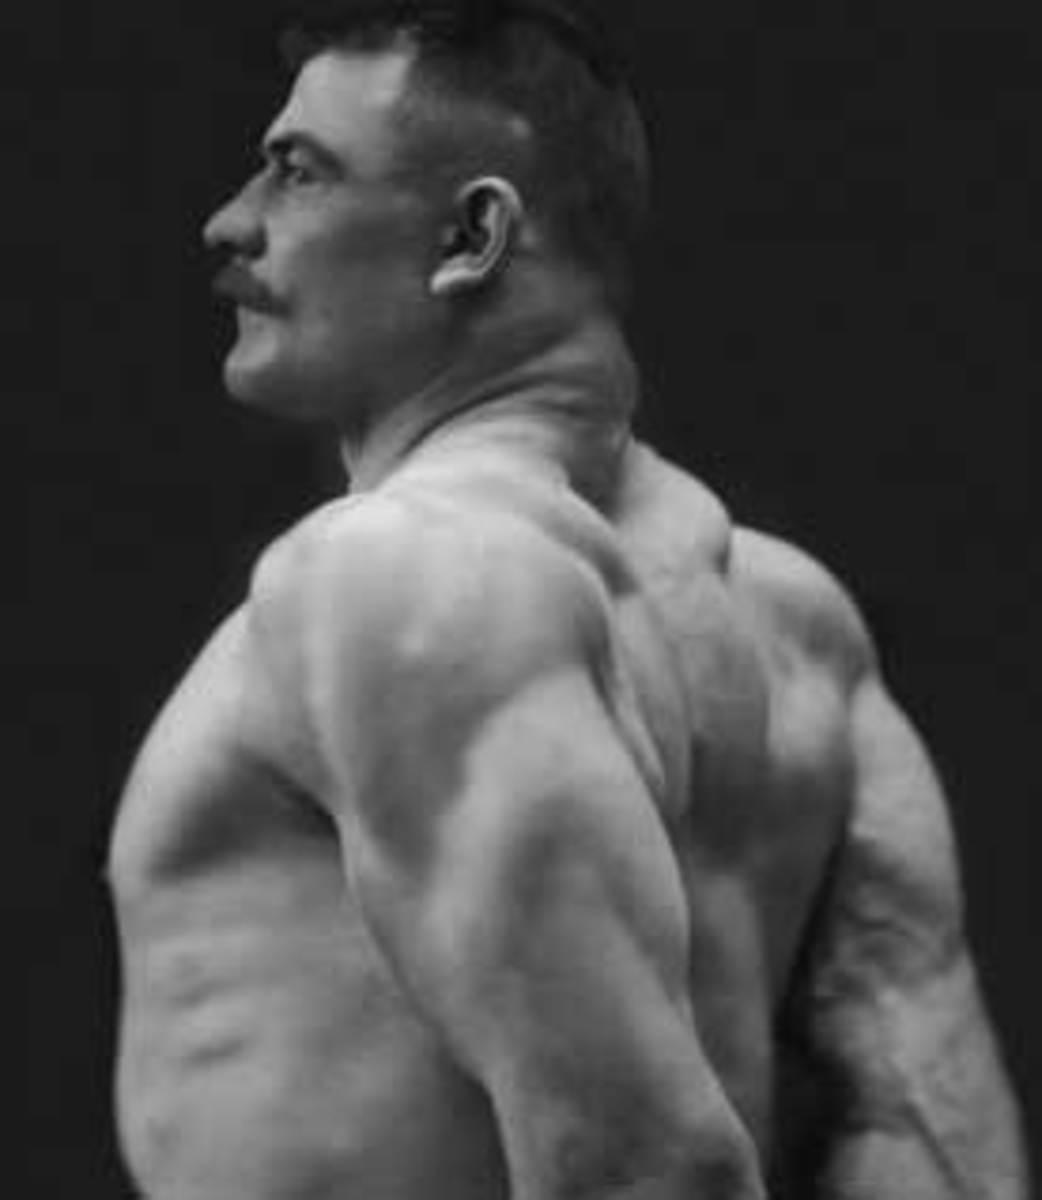 Training Terrific Triceps